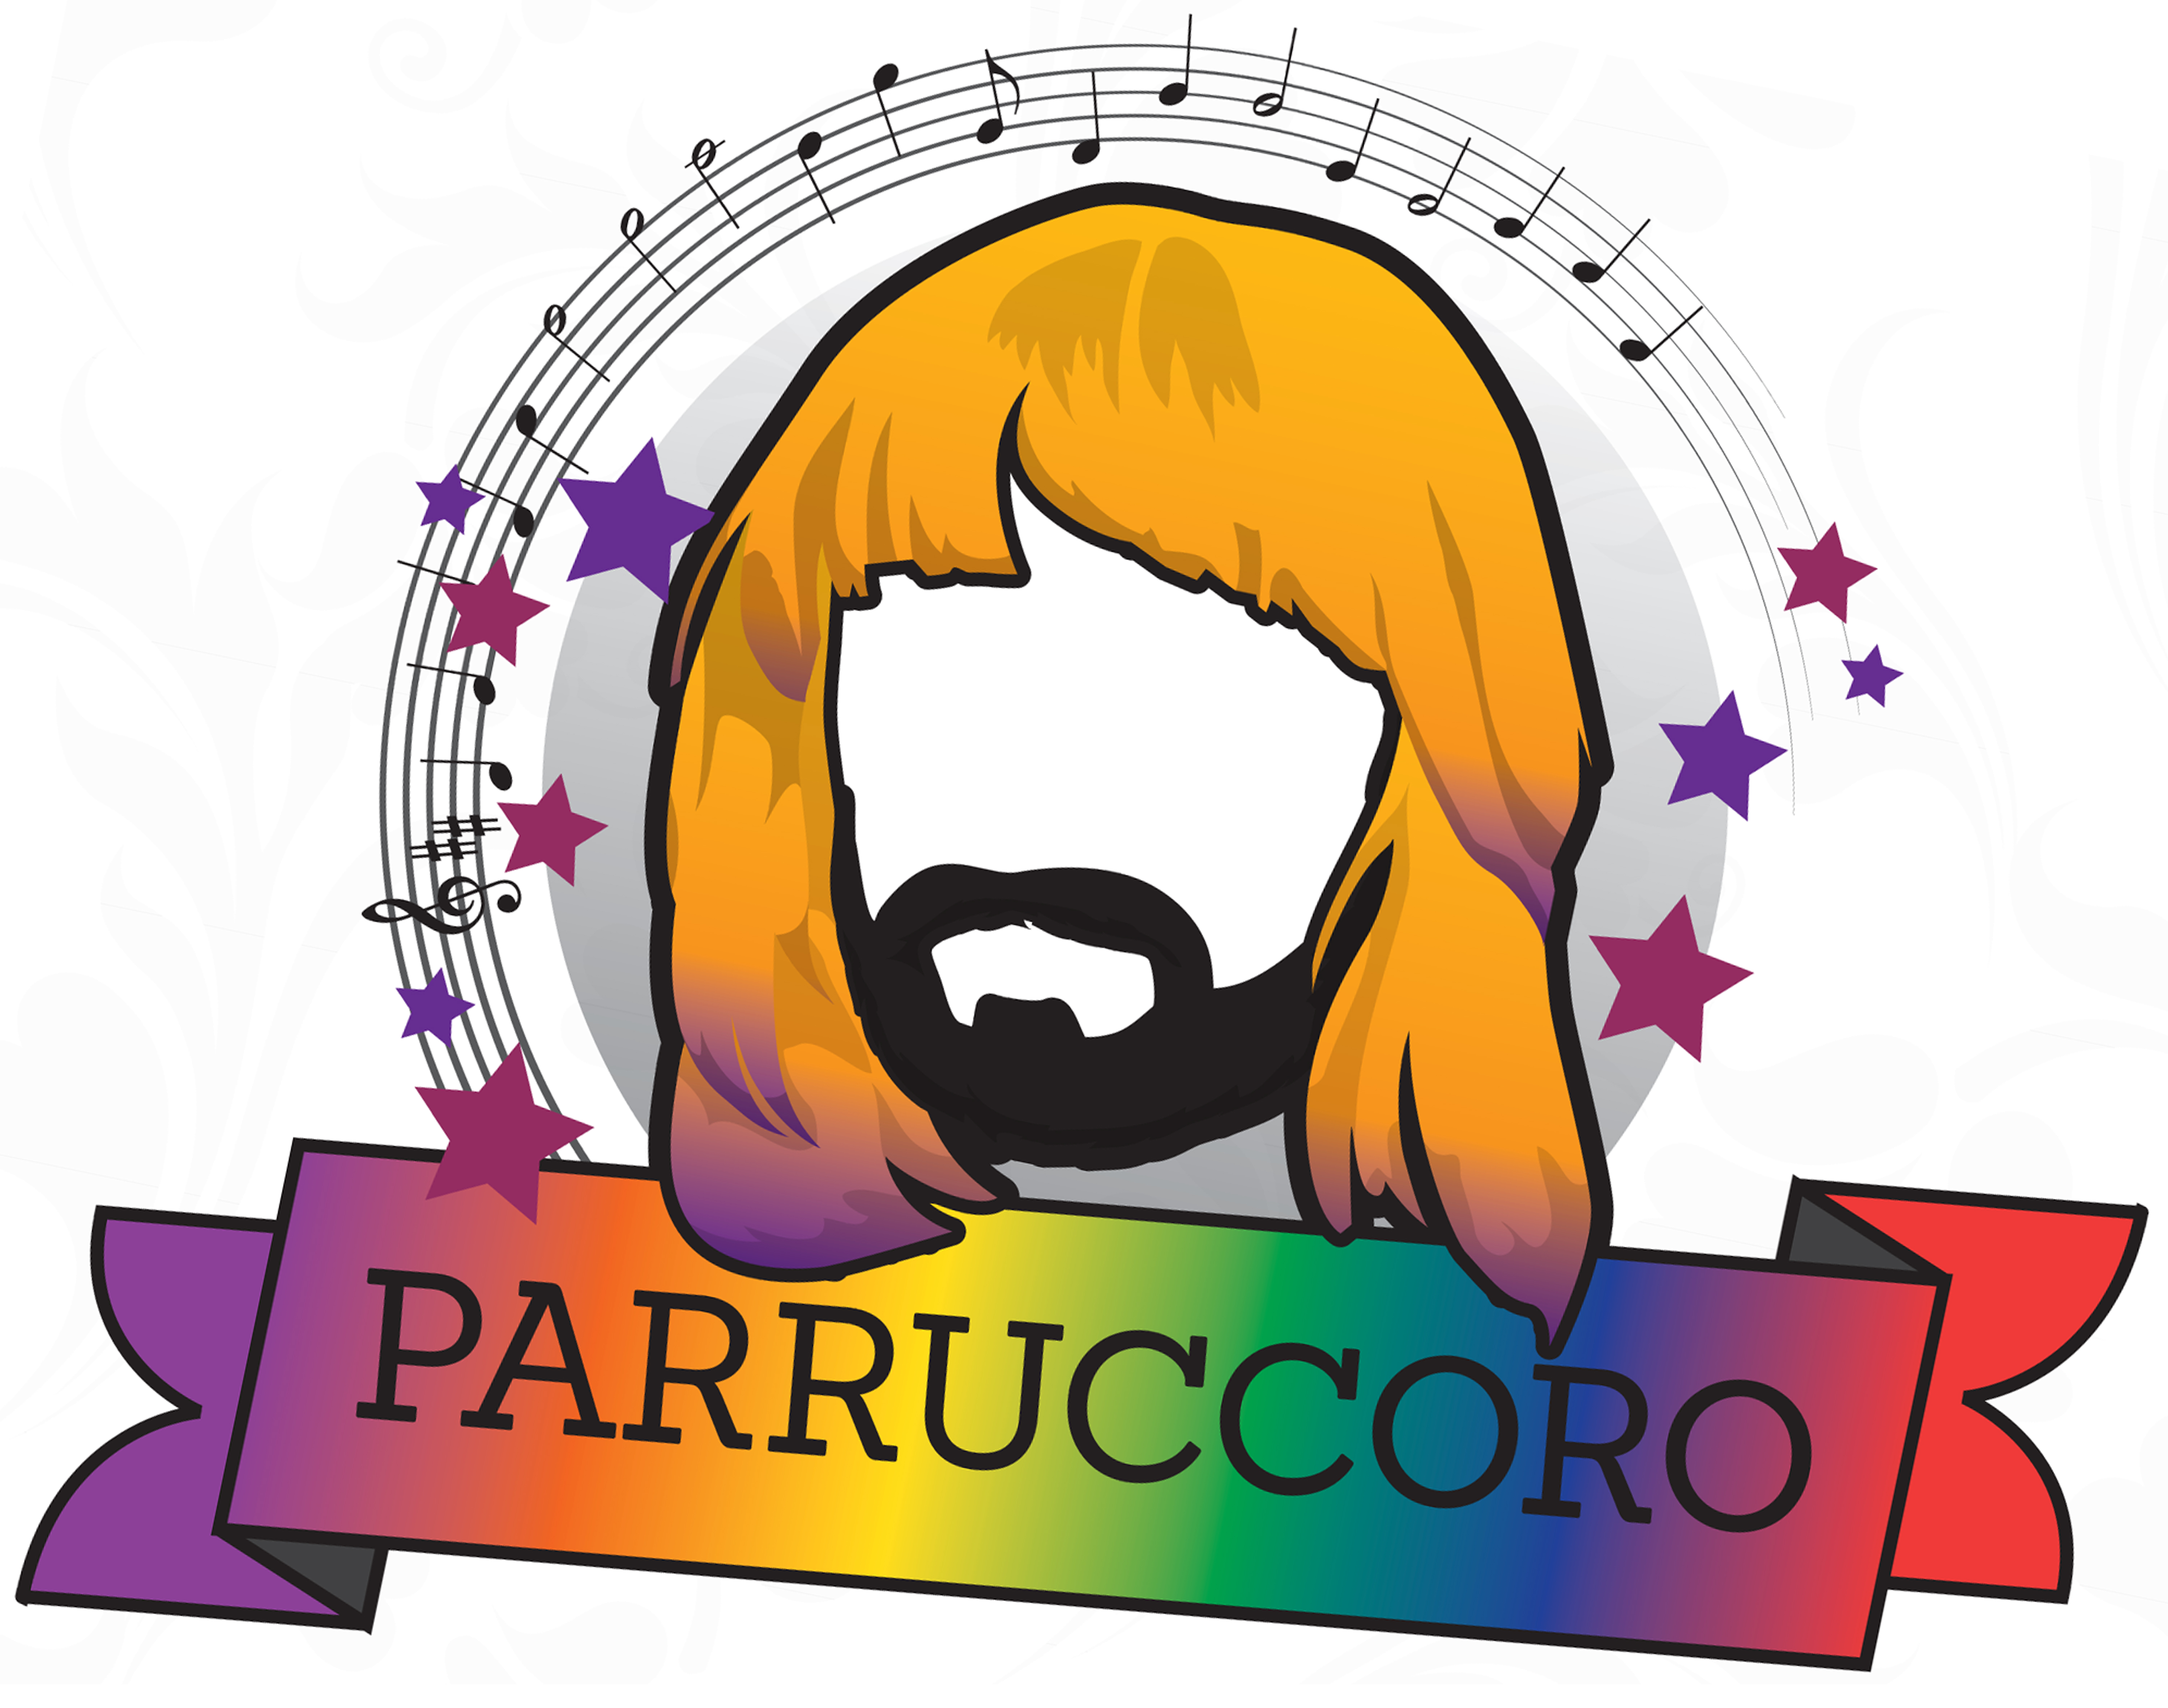 LOGO PARRUCCORO